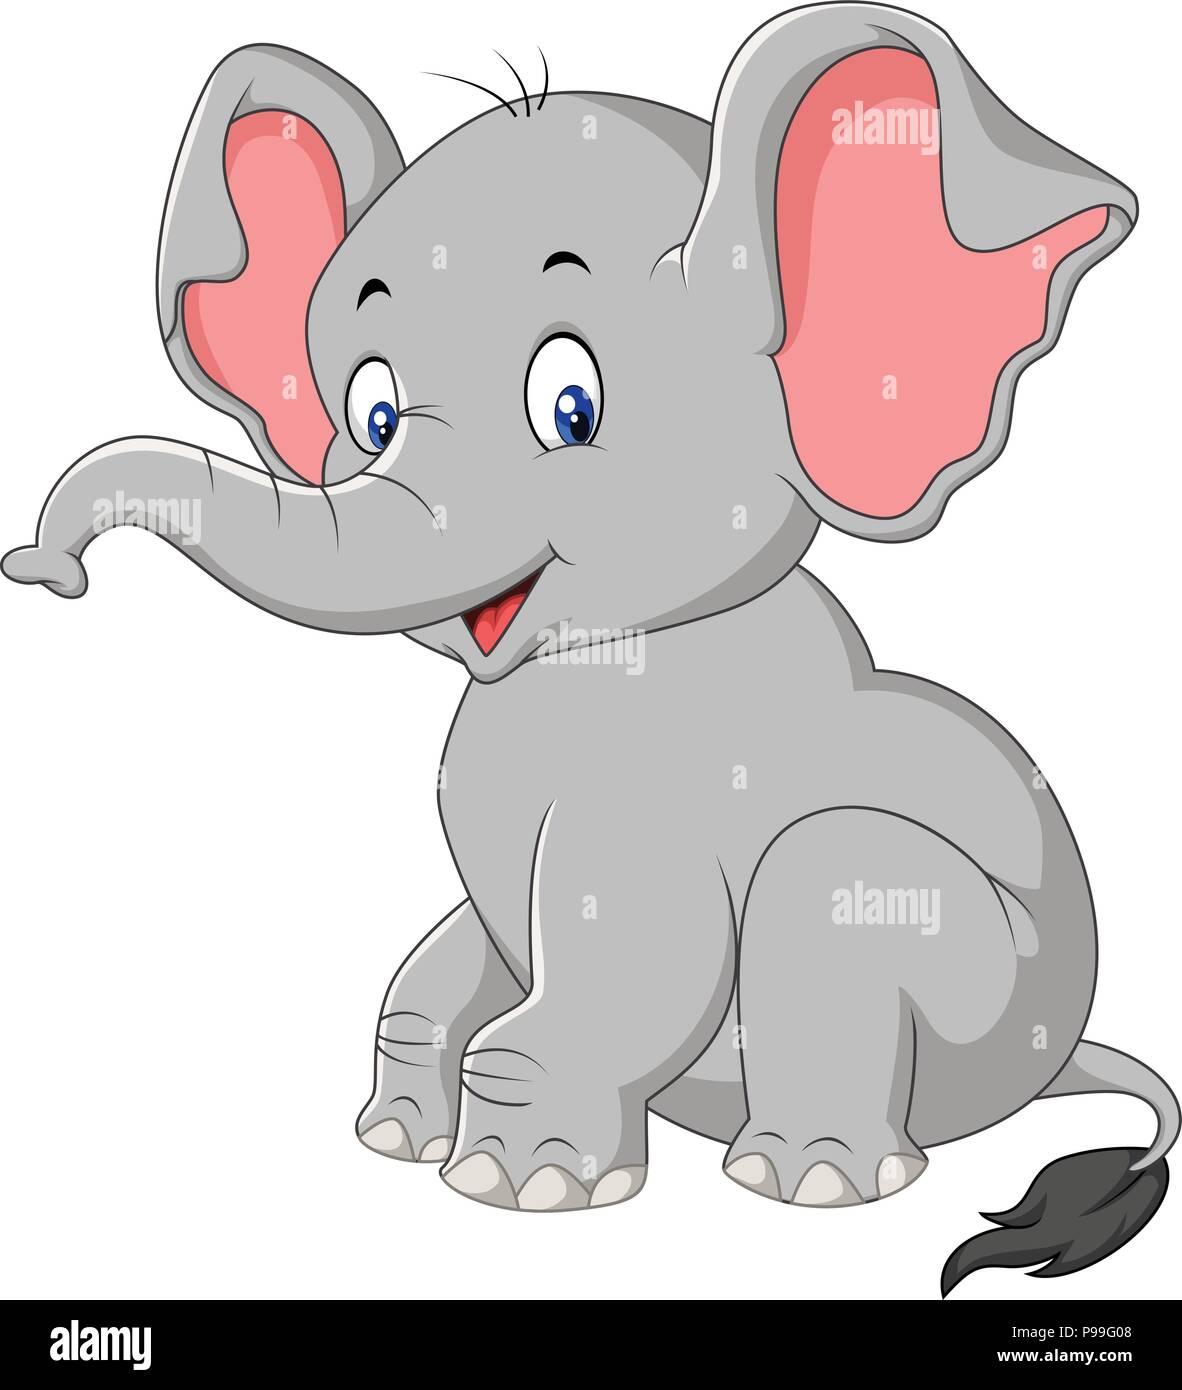 Cartoon Cute Baby Elephant Sitting Stock Vector Image Art Alamy